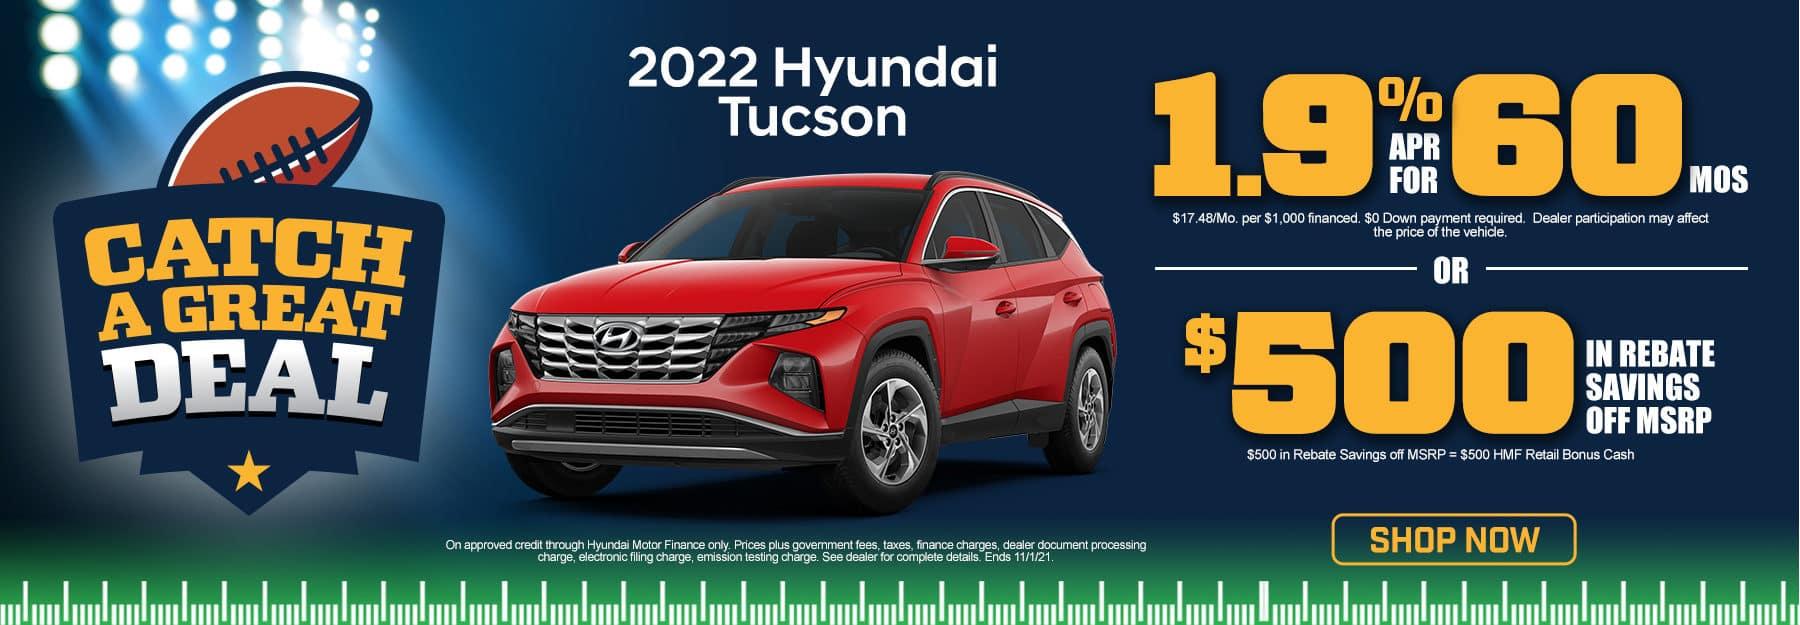 KNH210921_1800x625_Tucson